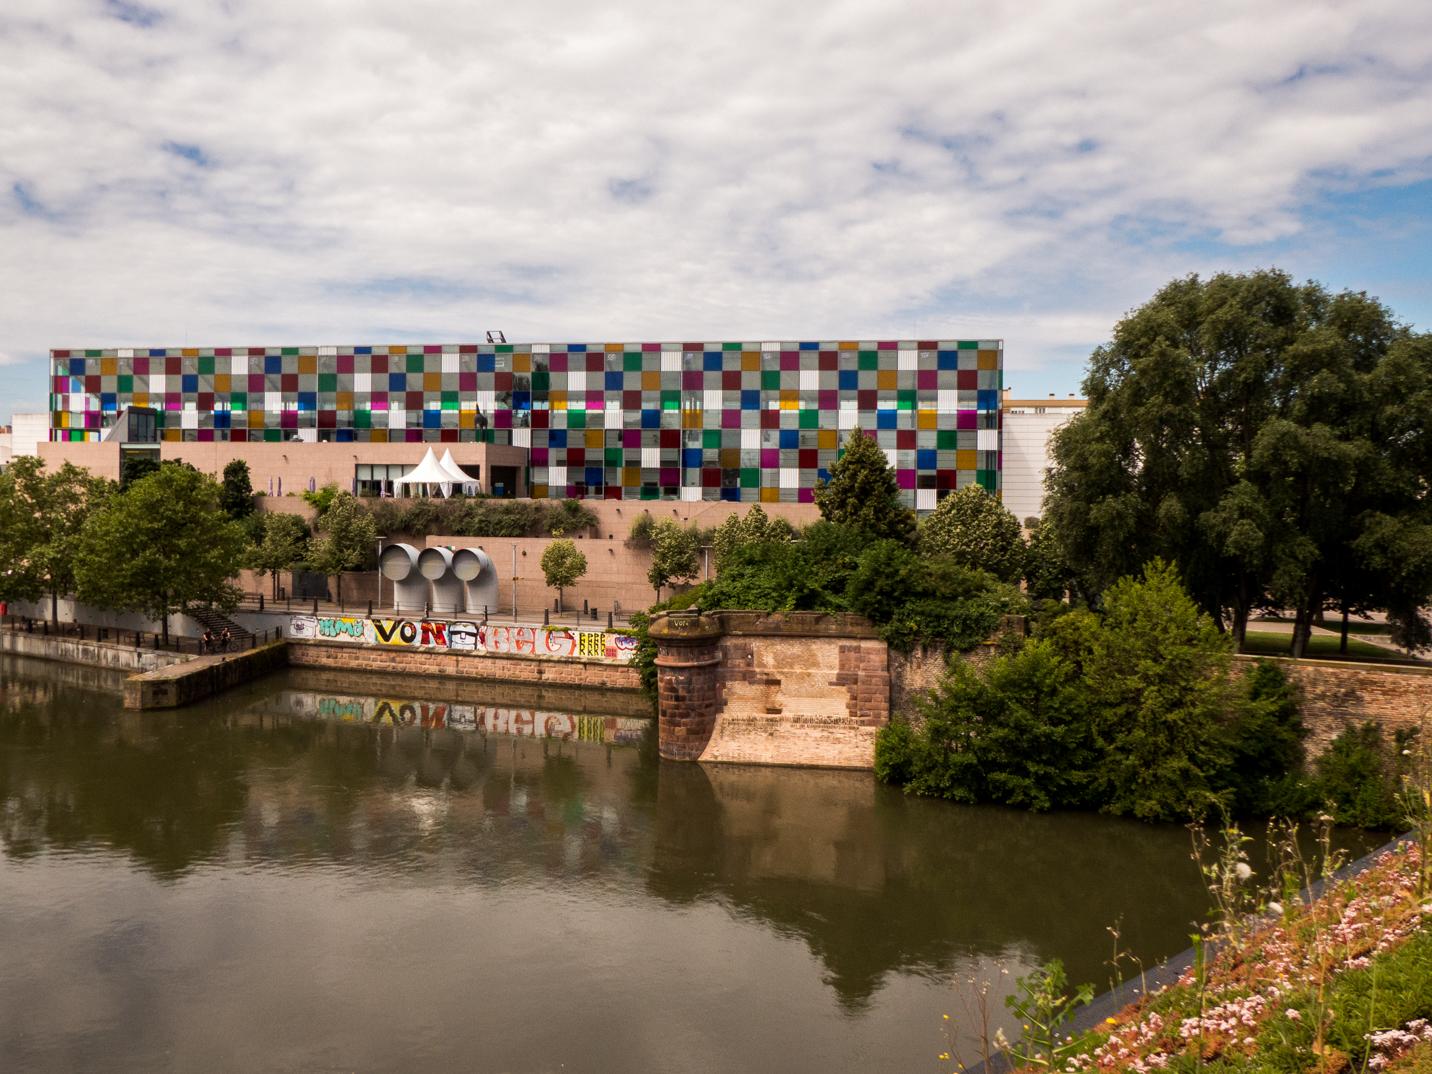 Vue de la terrasse du barrage Vauban